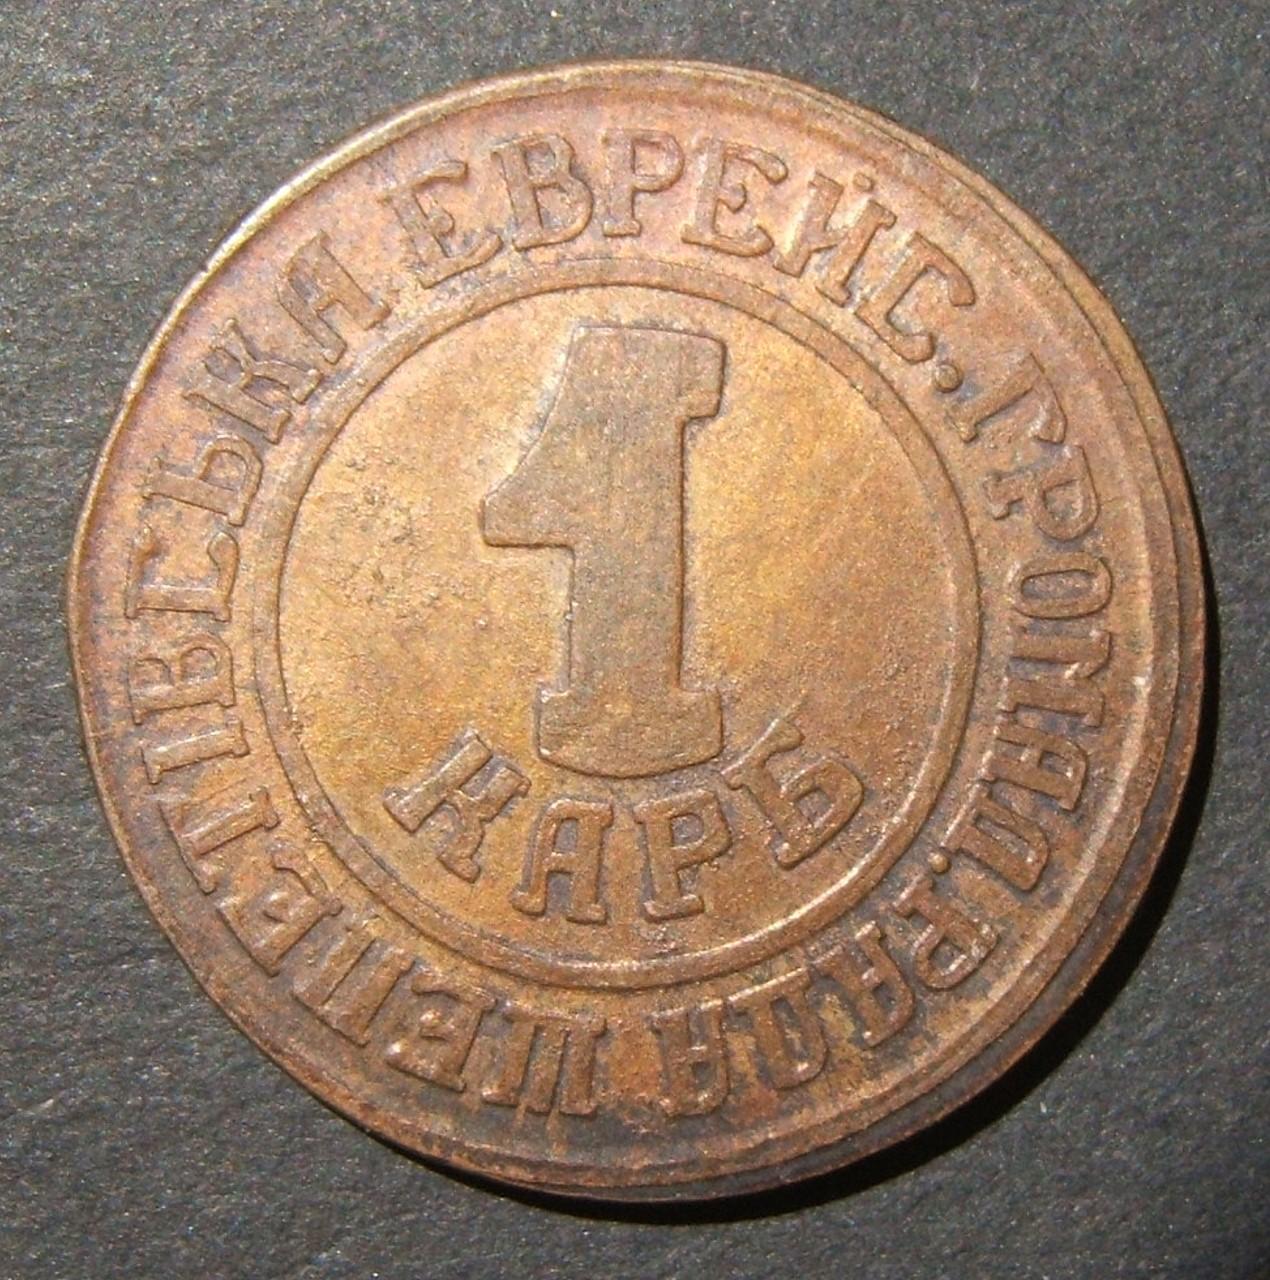 Ukraine: Shepetivka/ Shepetovka 1 Karbovanets Jewish bronze token, c.1900; size: 2.7cm; weight: 7.85g. Obv.: